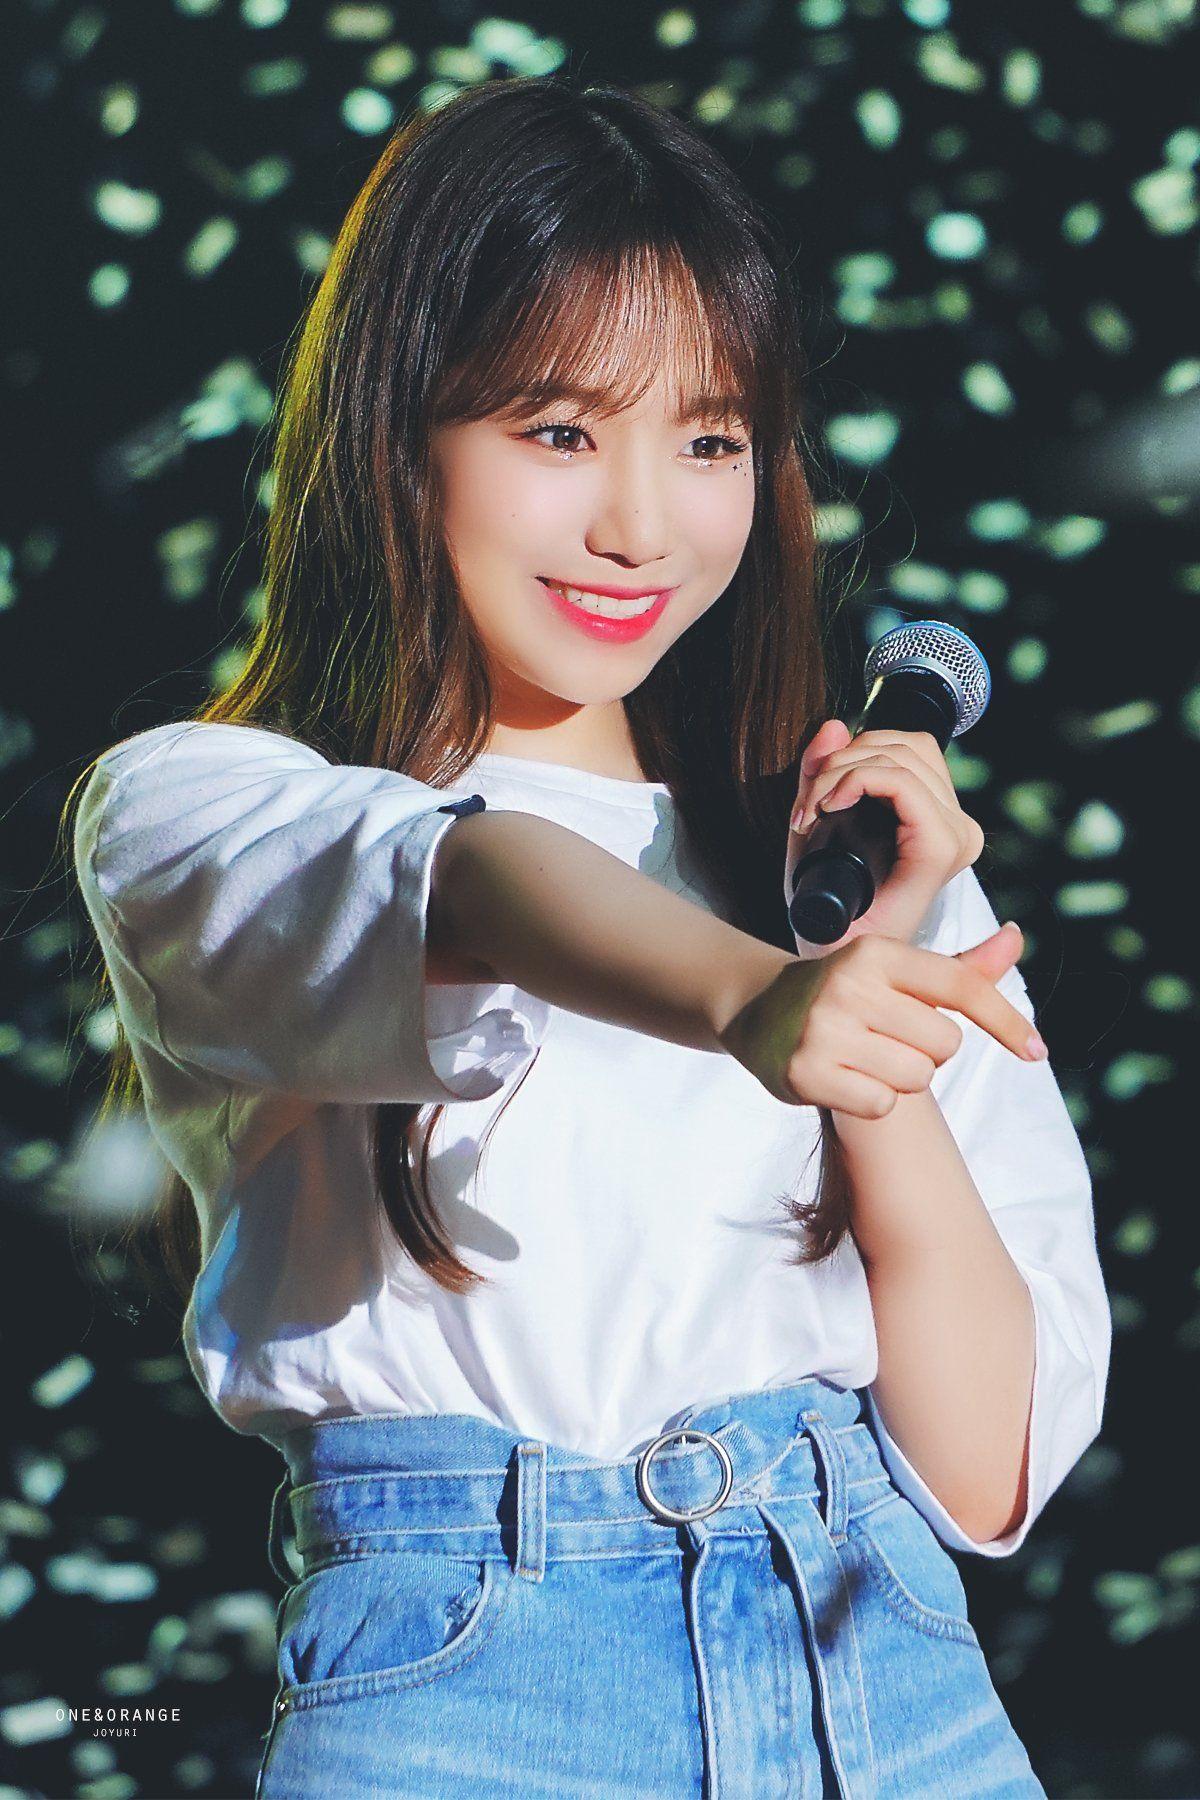 Yuri kpop kdrama bts exo kpoparmy Yuri, Girls